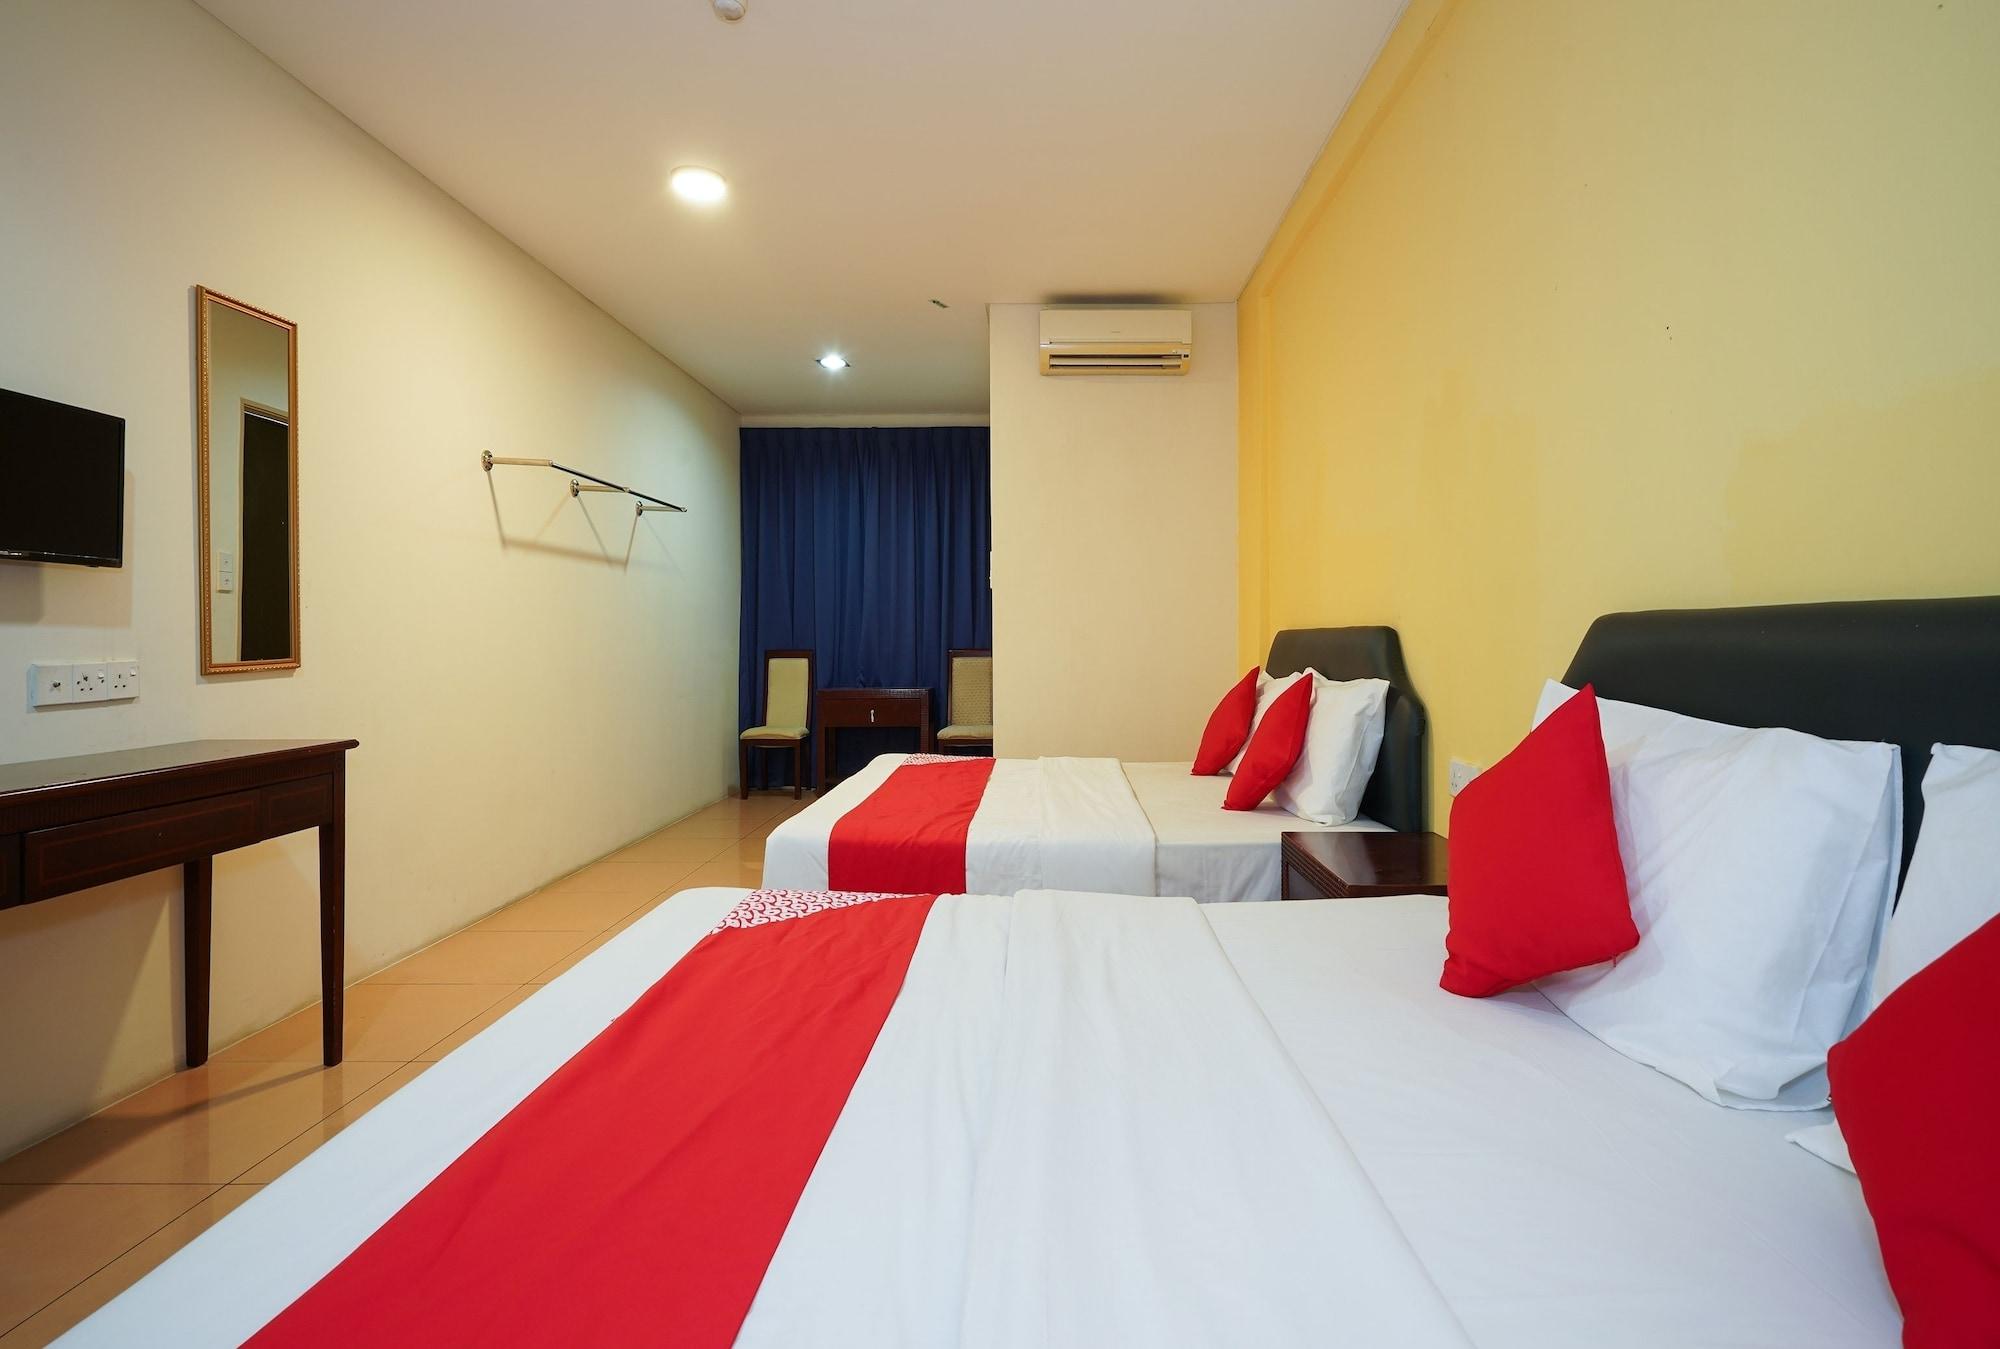 OYO 43955 N9 Business Hotel, Seremban